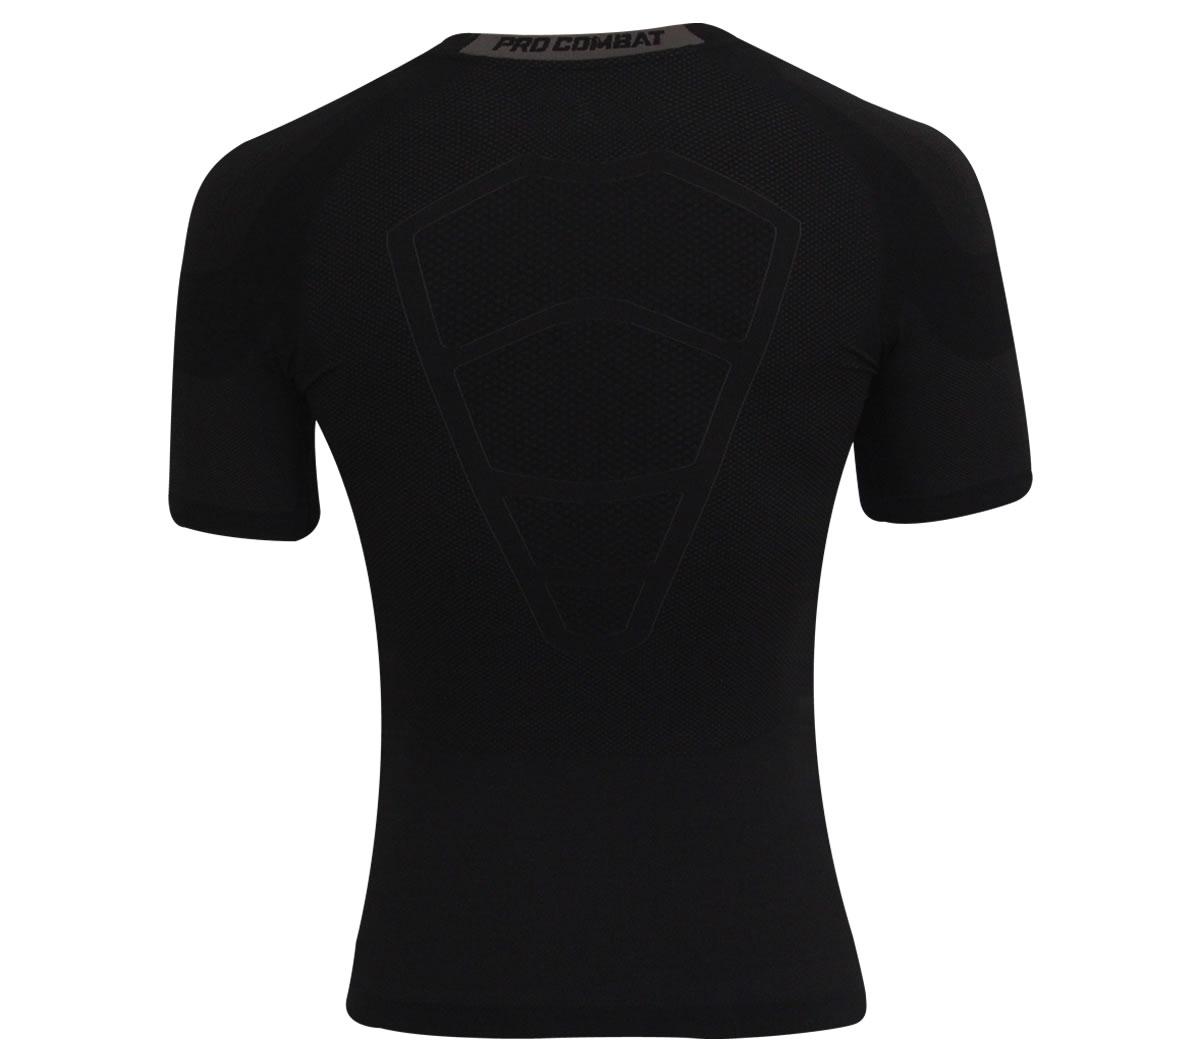 Camisa Nike Pro Core Hypercool Manga Curta Preta - Mundo do Futebol 2c789c624826b